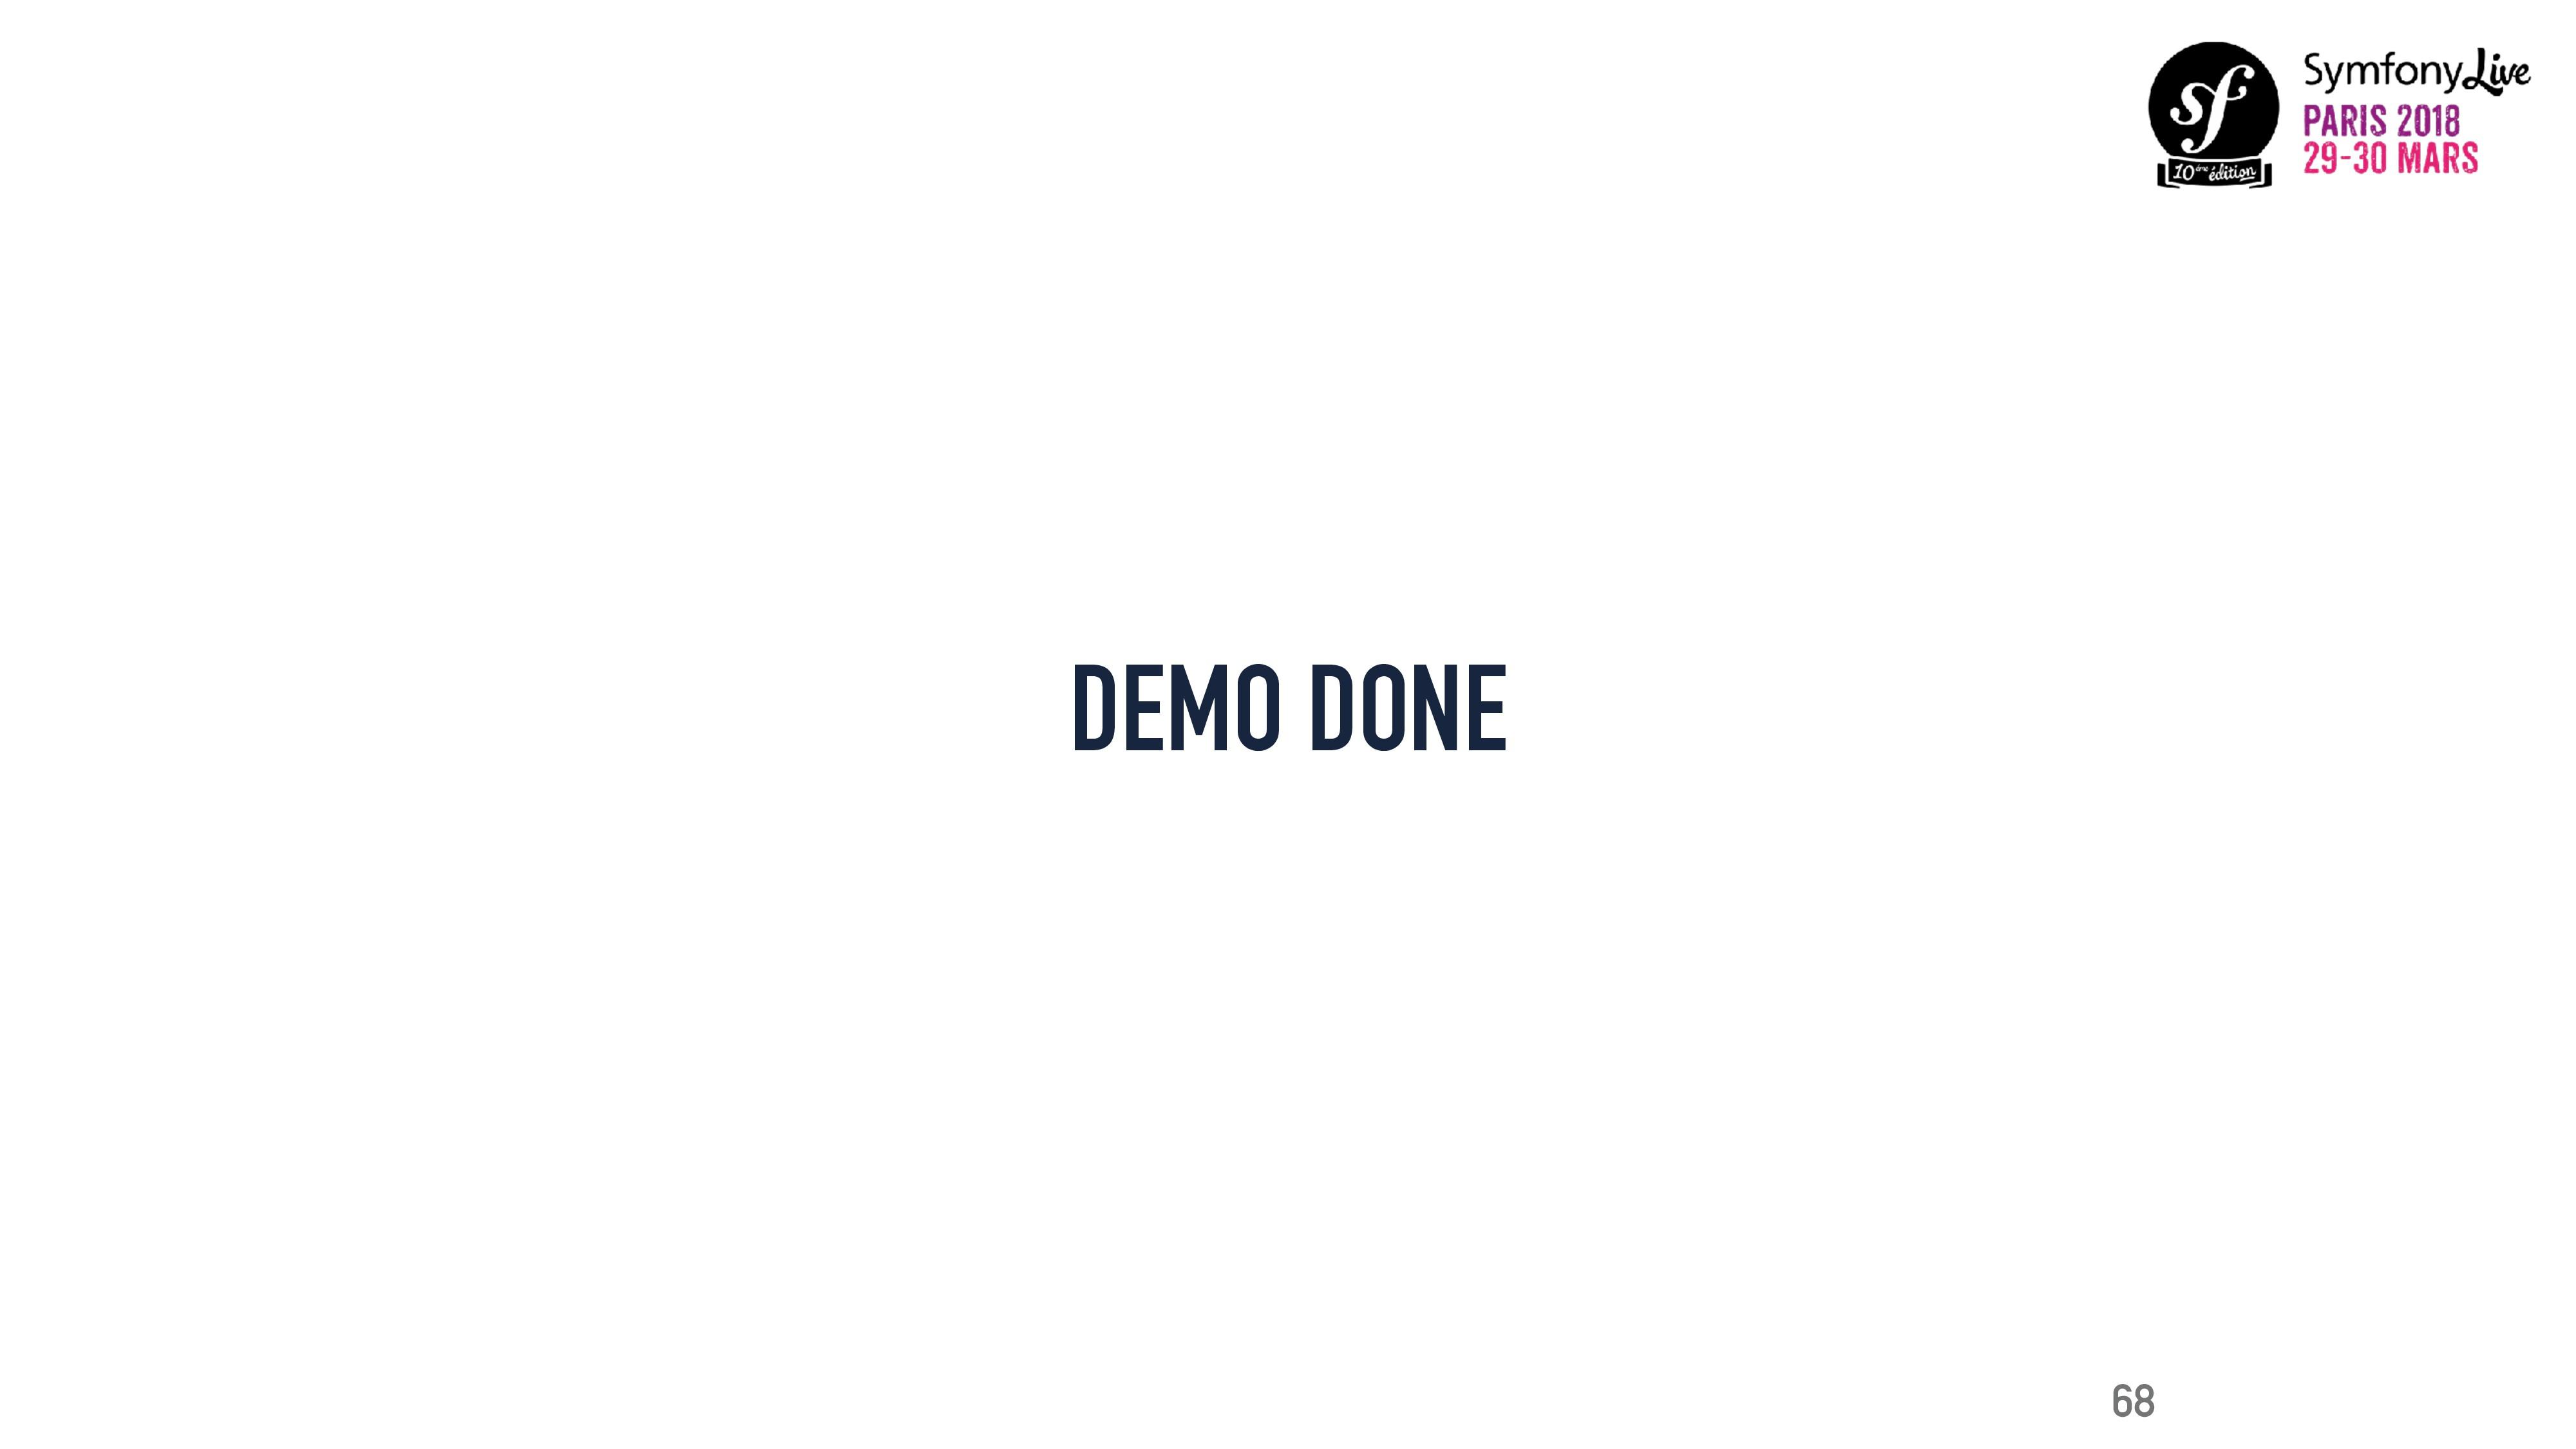 DEMO DONE 68